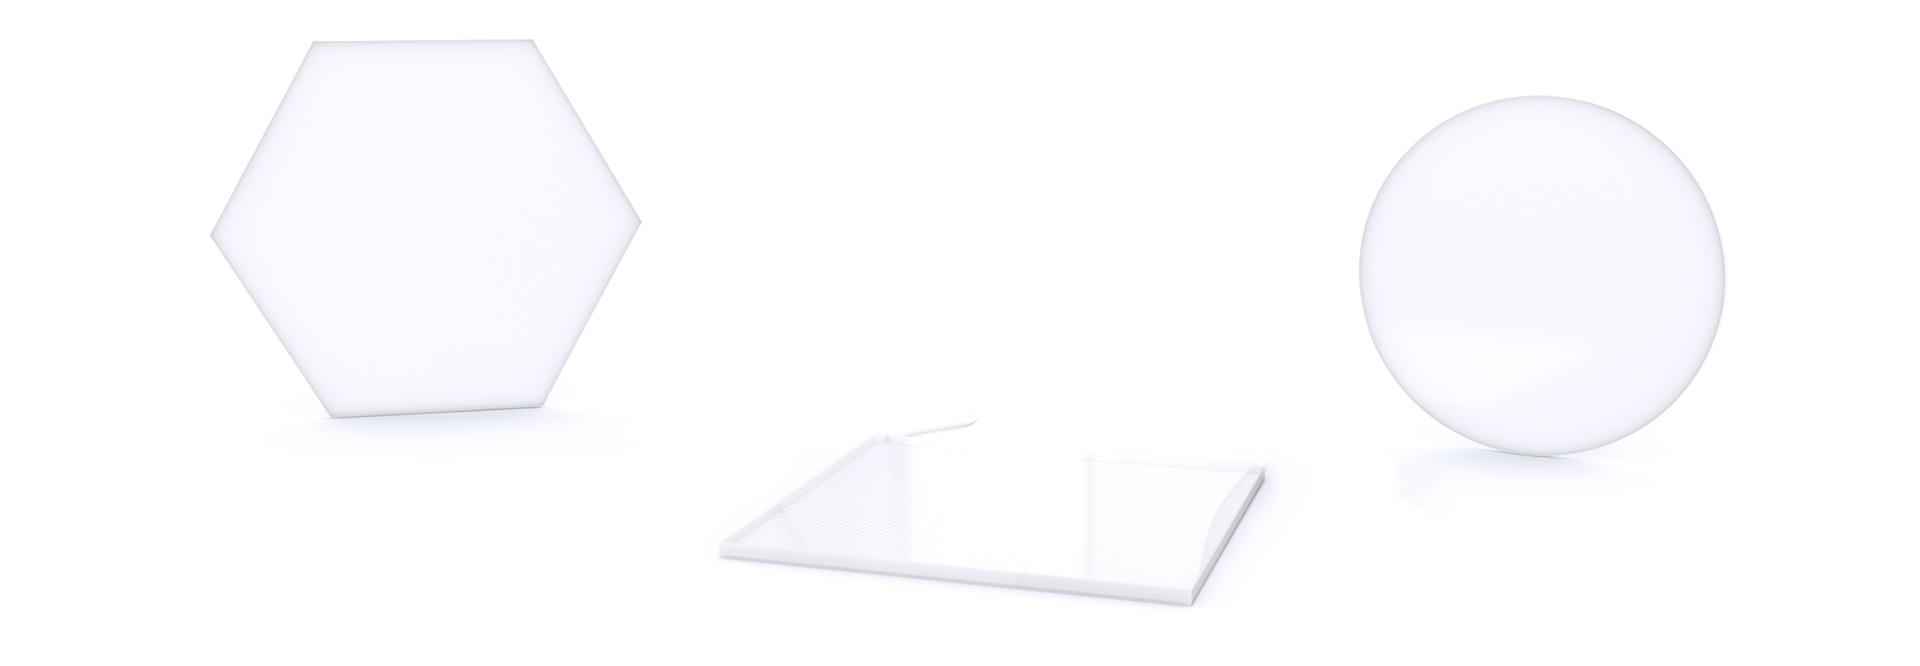 PC2 Linear Fixture